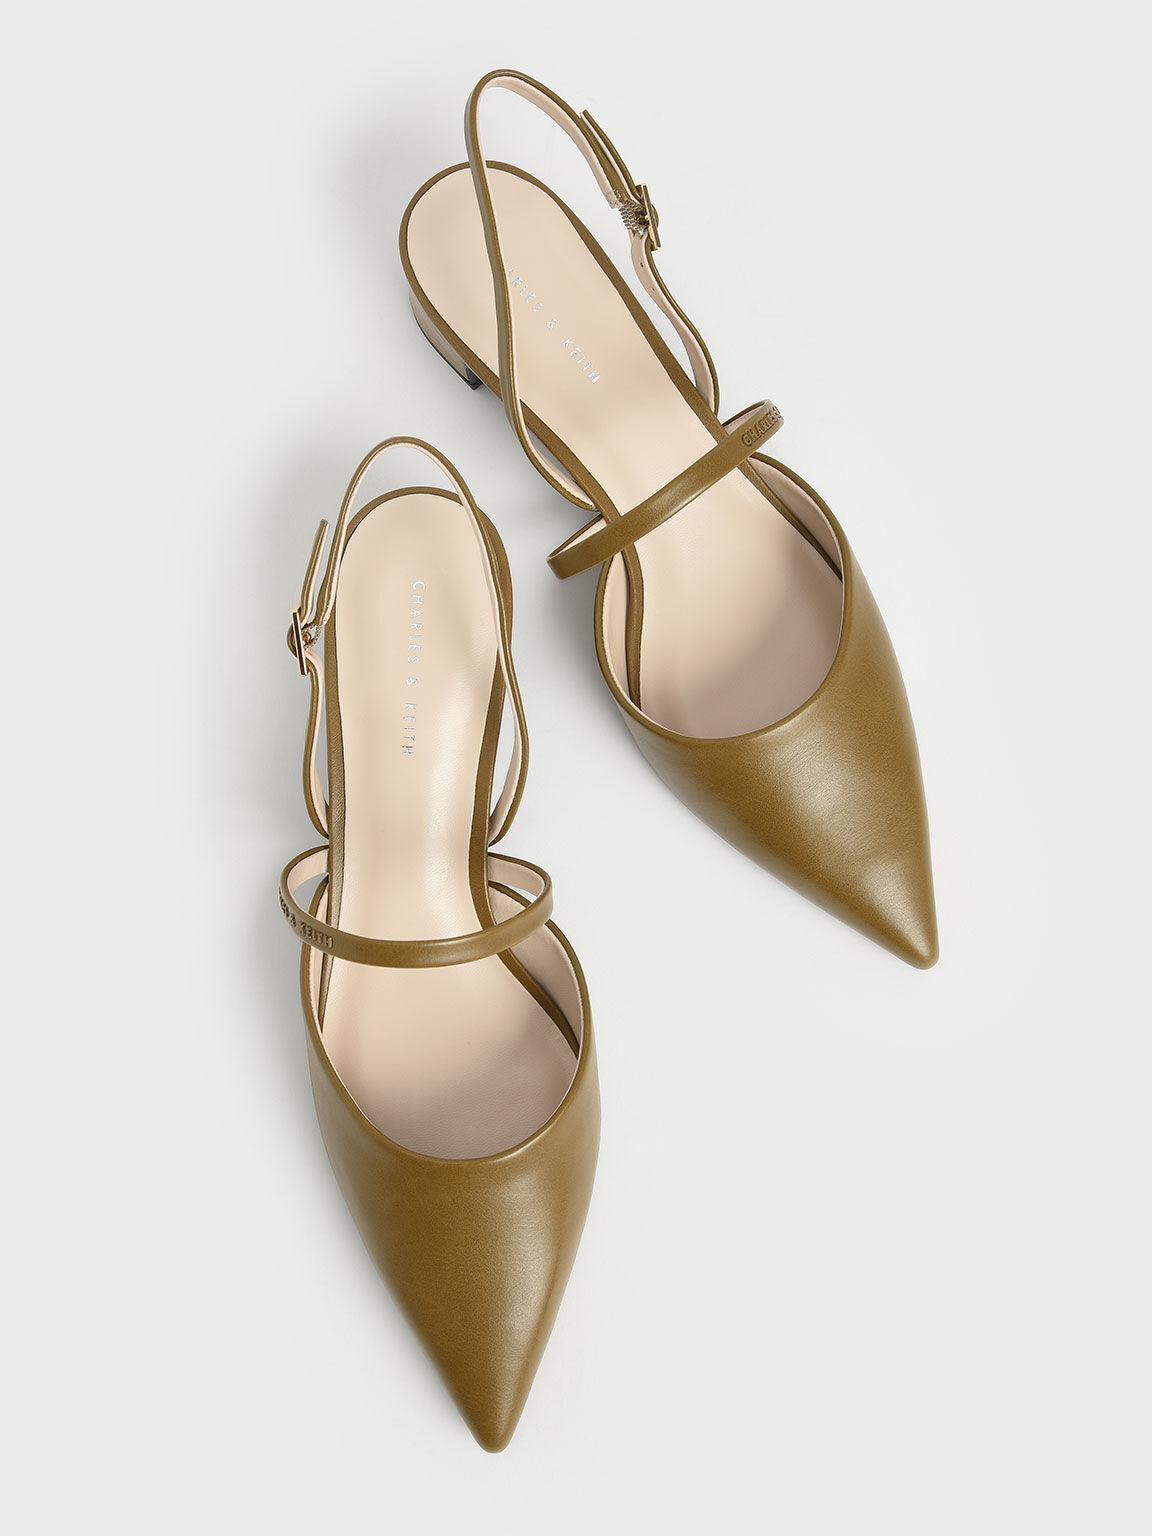 Sepatu Slingback Heeled Mary Janes, Olive, hi-res